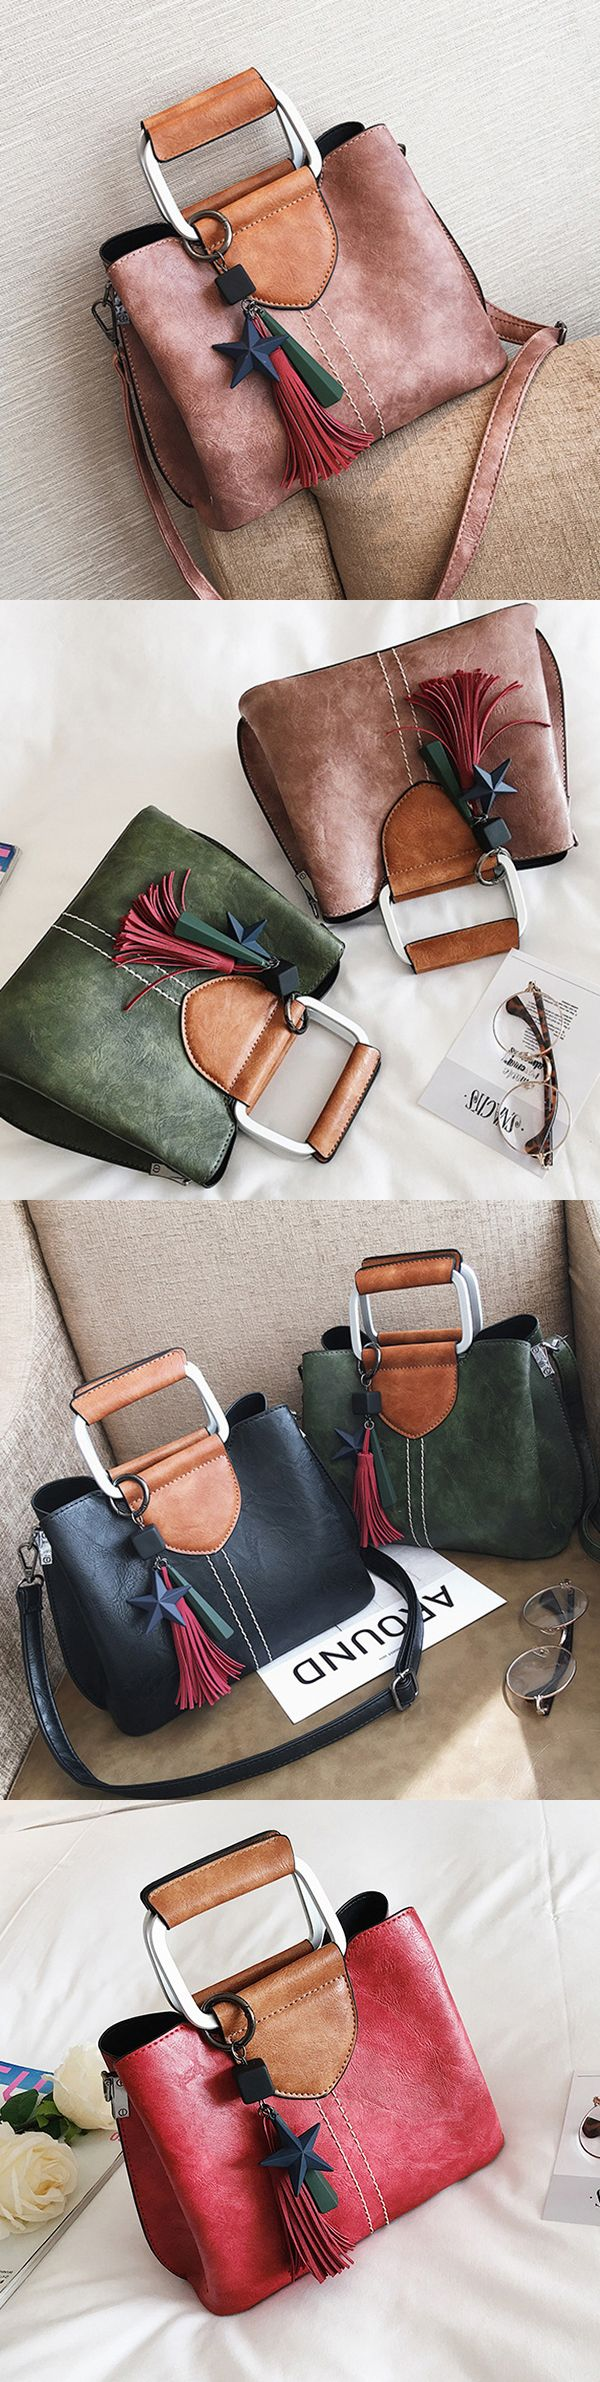 US$28.87 Women Hitcolor Retro Oil Leather Tote Bag Crossbody Bag